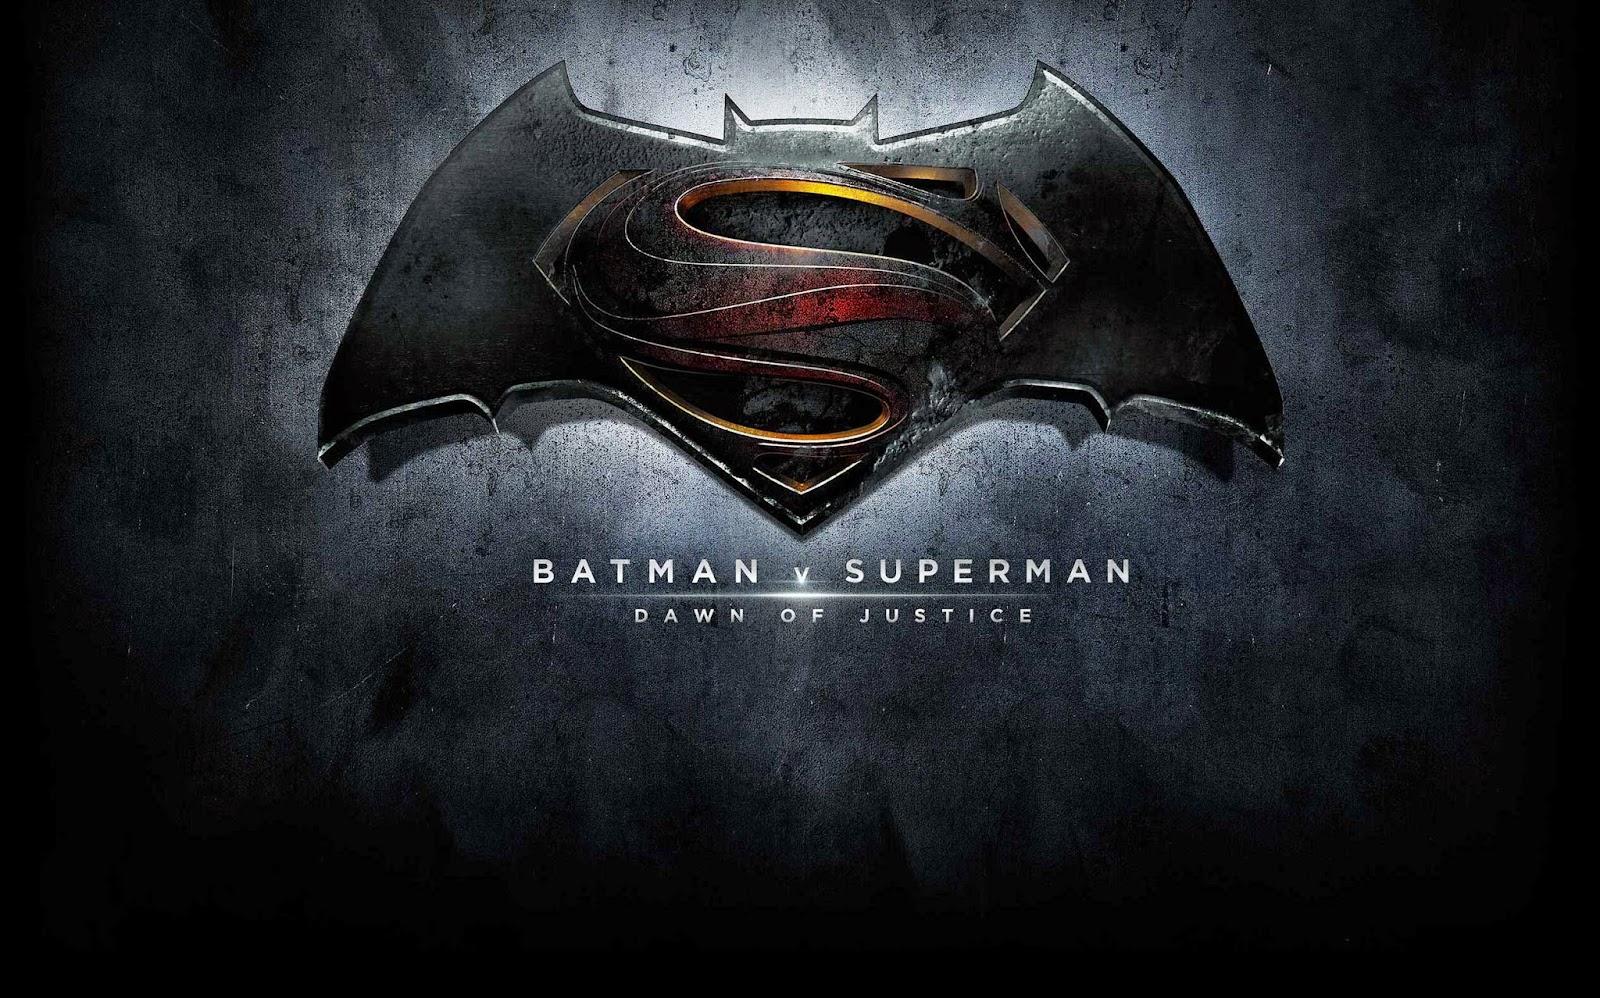 acik kafa sinemasi batman v superman dawn of justice batman superman adaletin safagi 2016